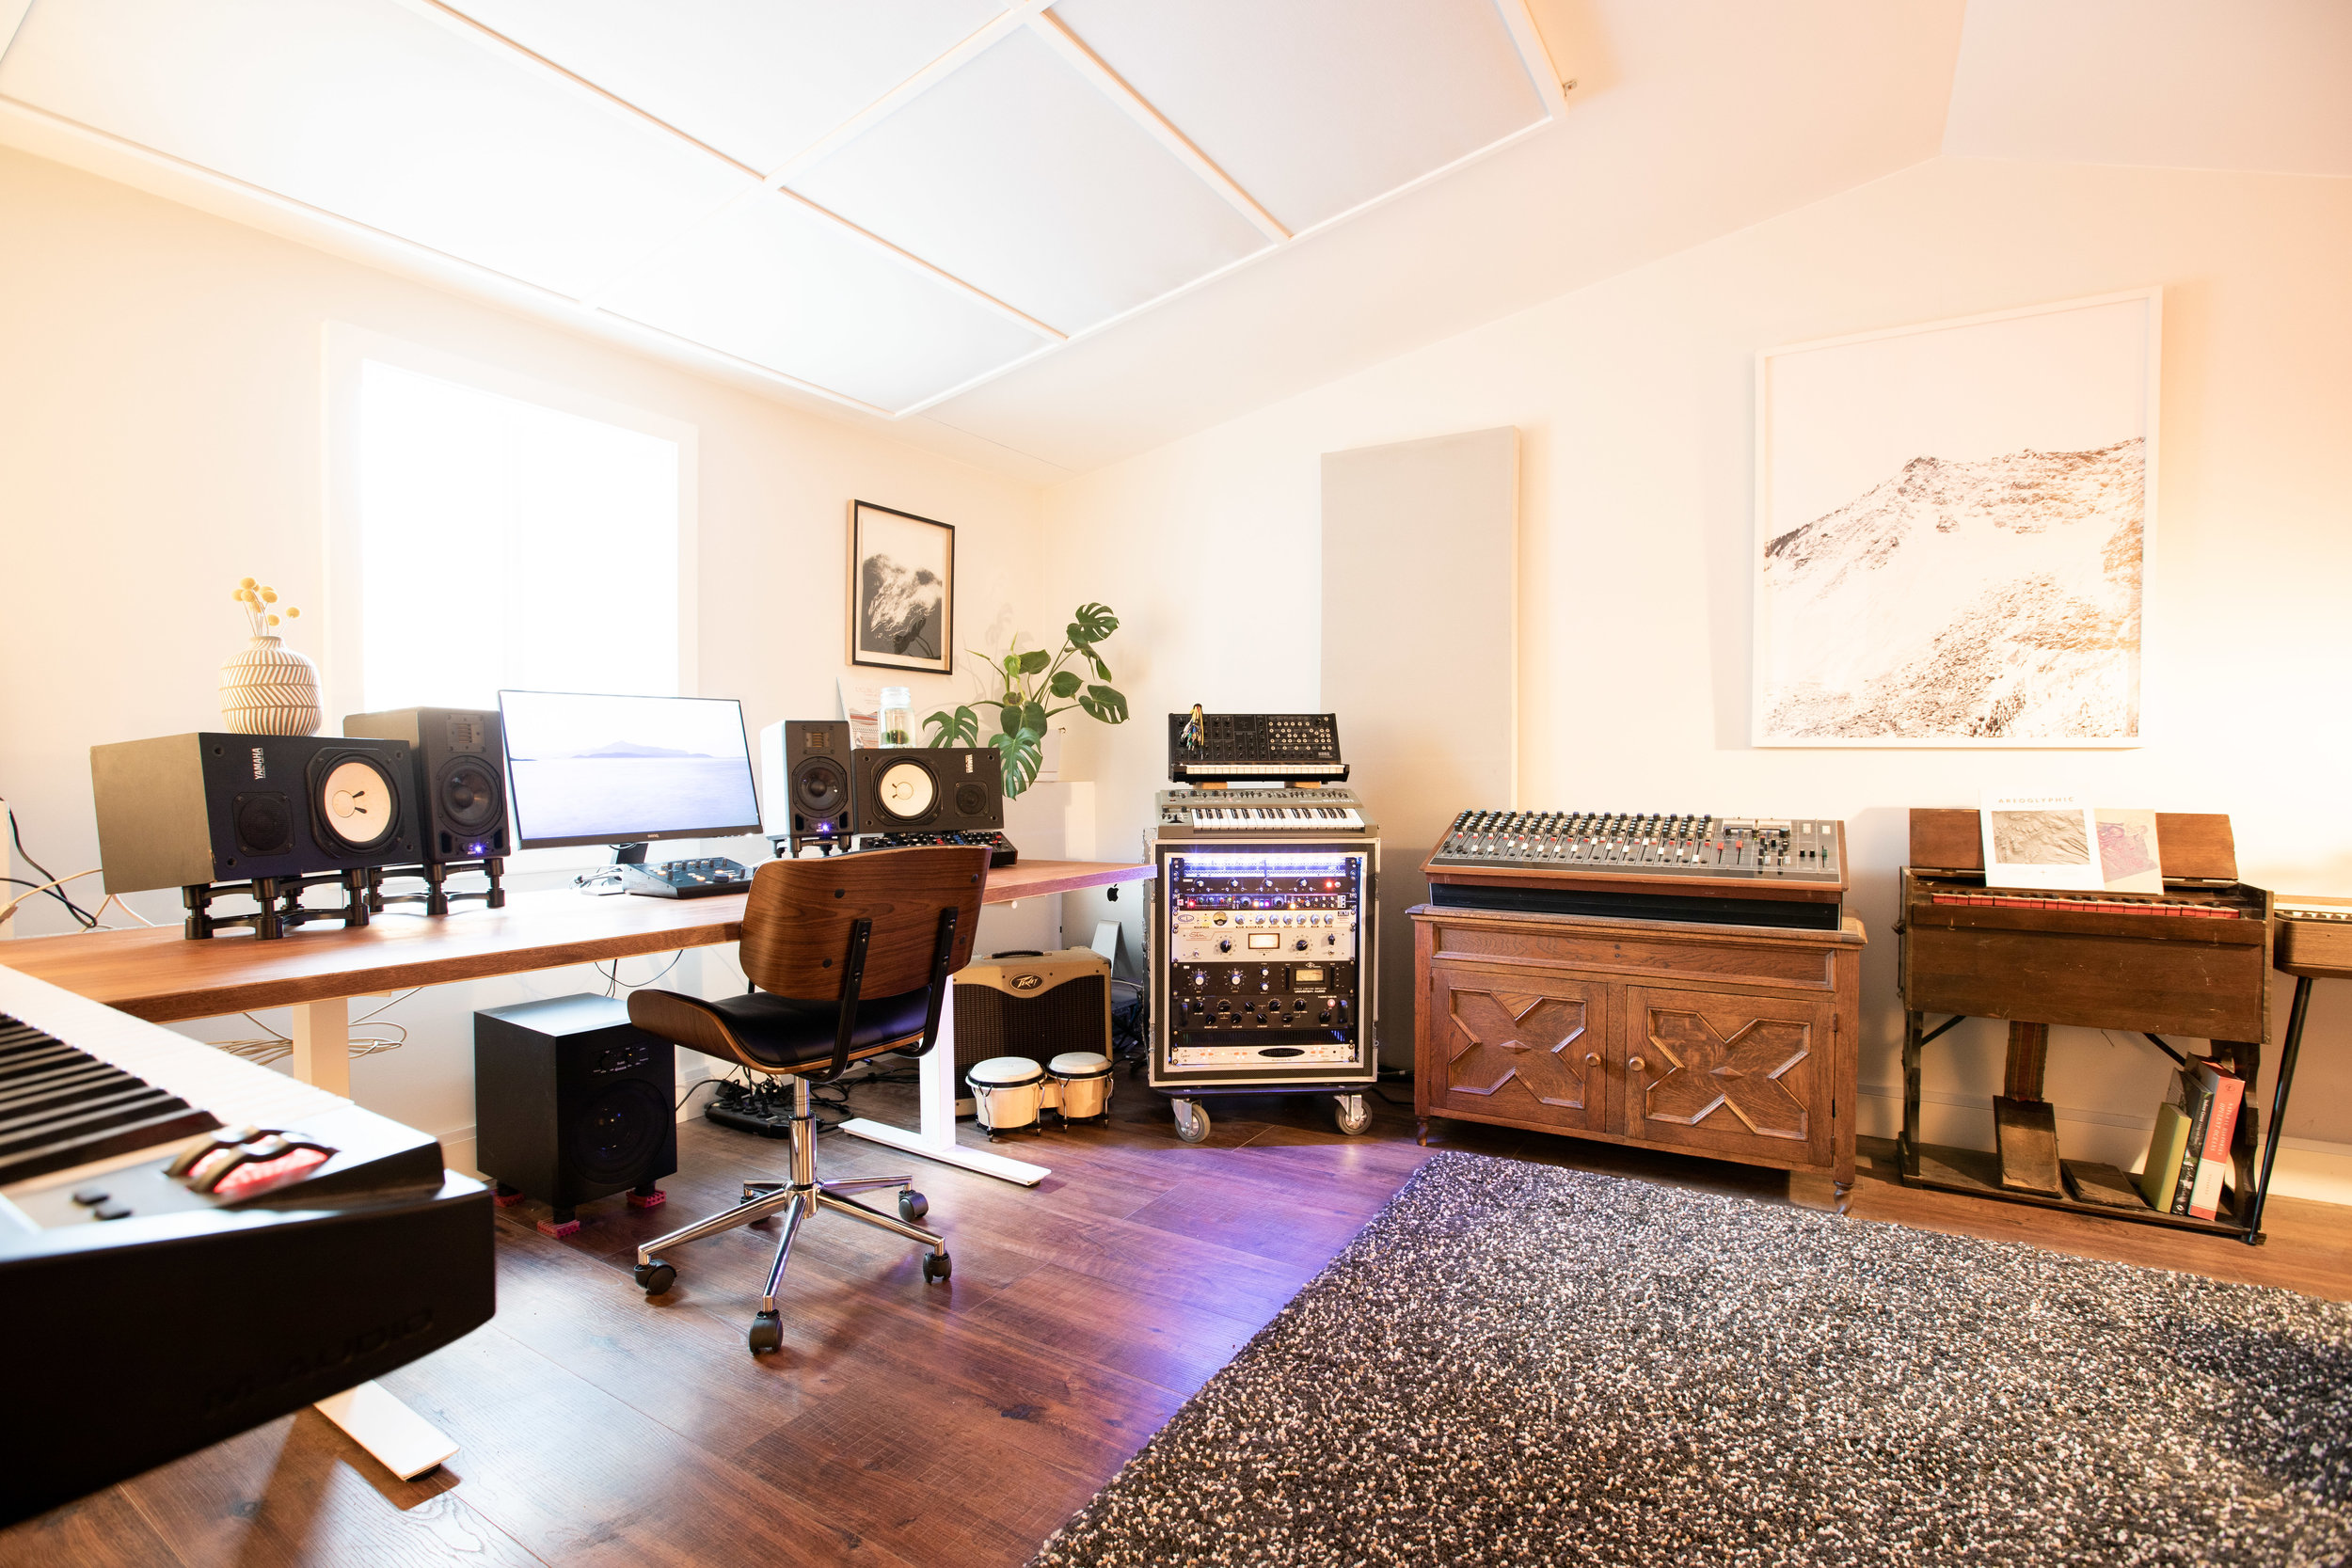 Fall Back Studios - Studio 1 Image 3